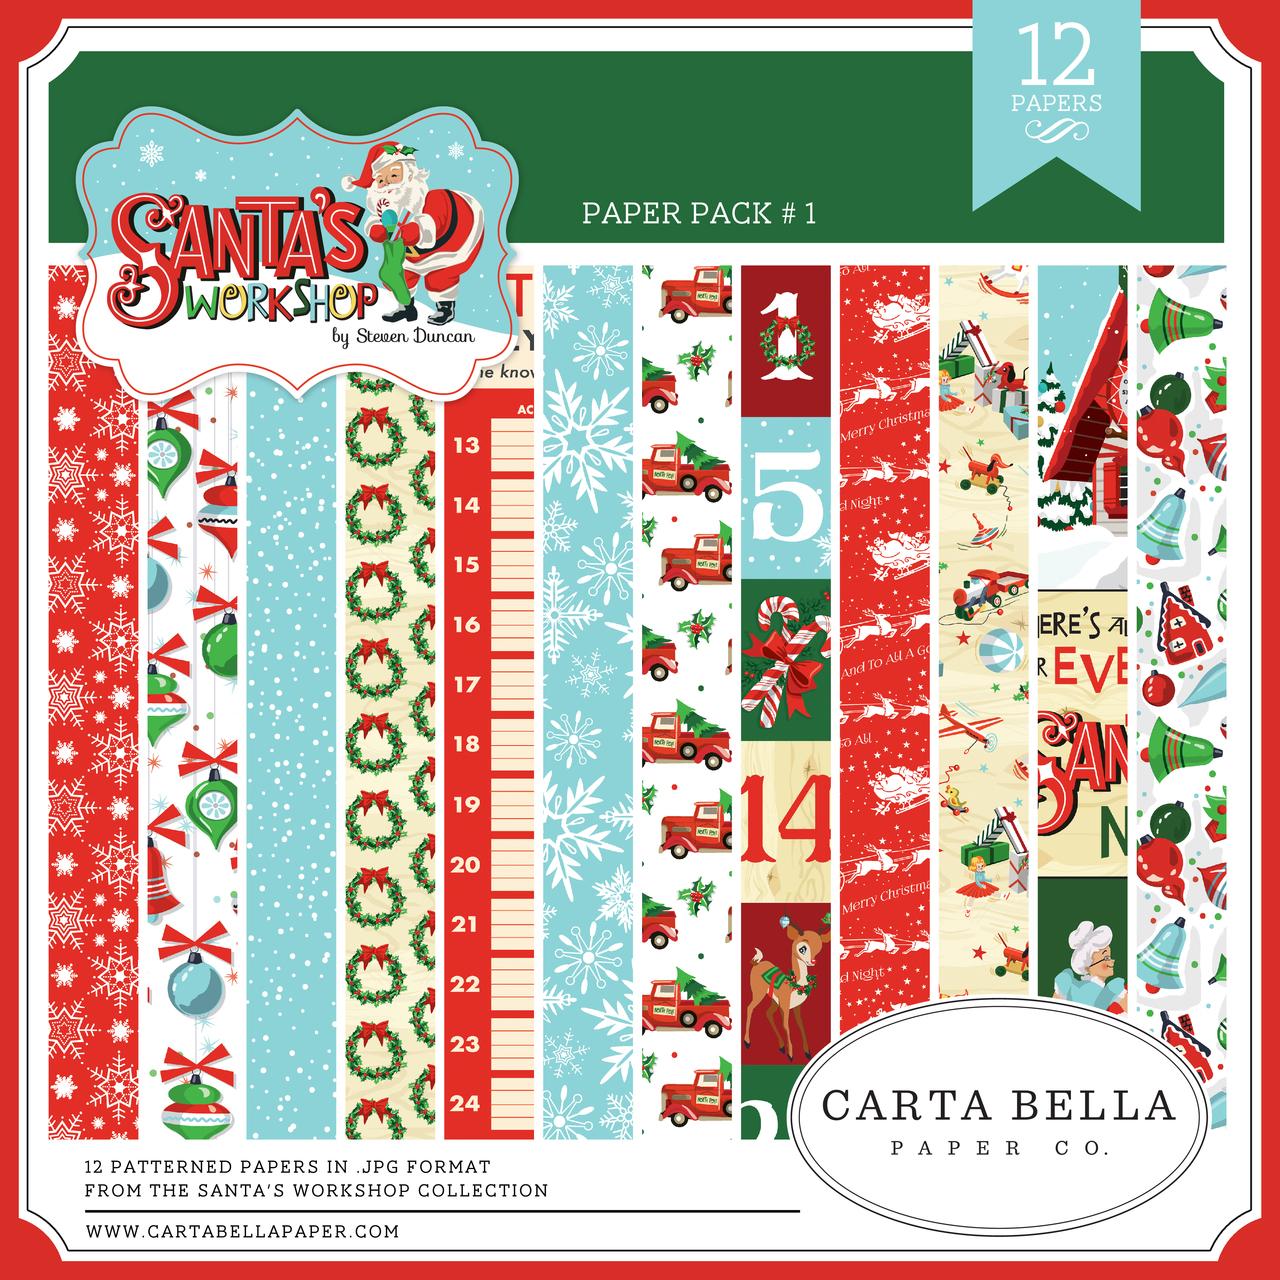 Santa's Workshop Paper Pack #1